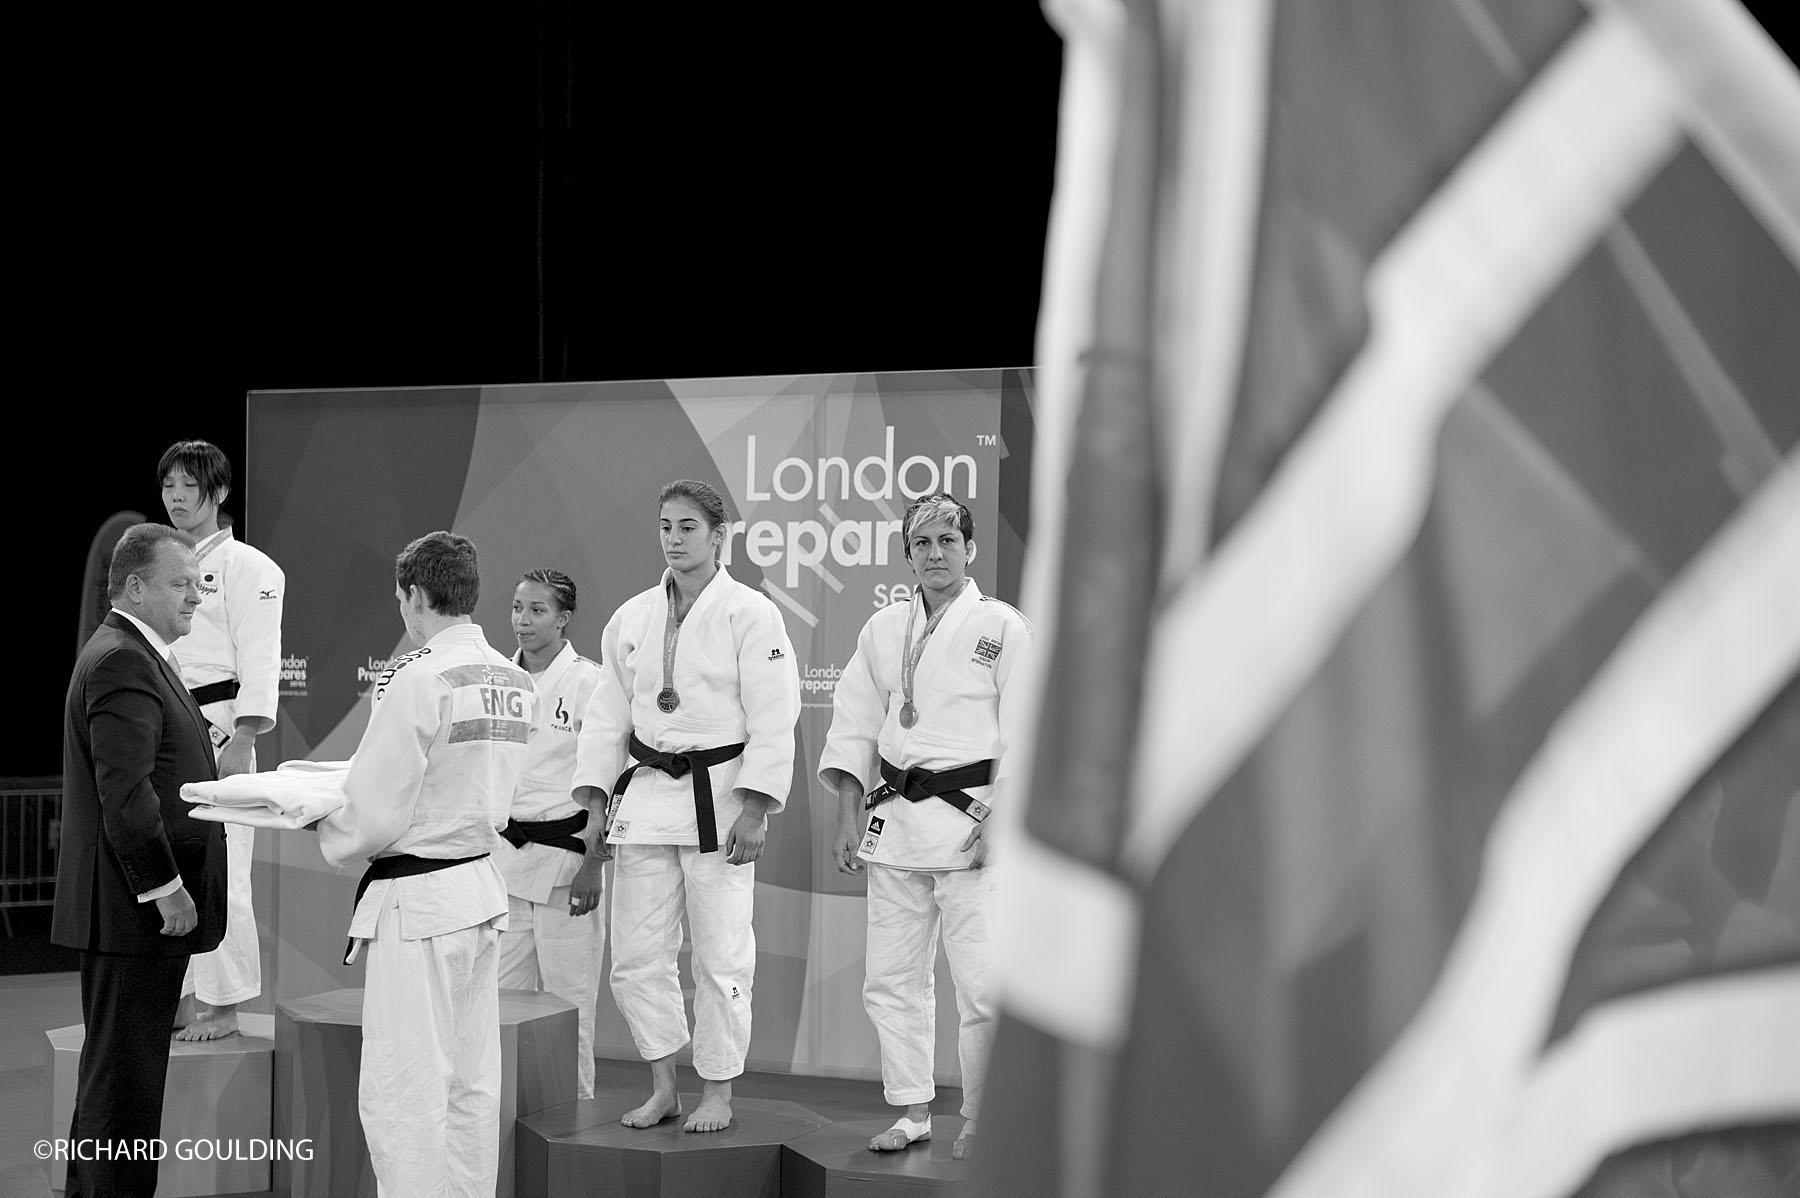 Sophioe Cox, winner bronze medal at the London Prepares test event.